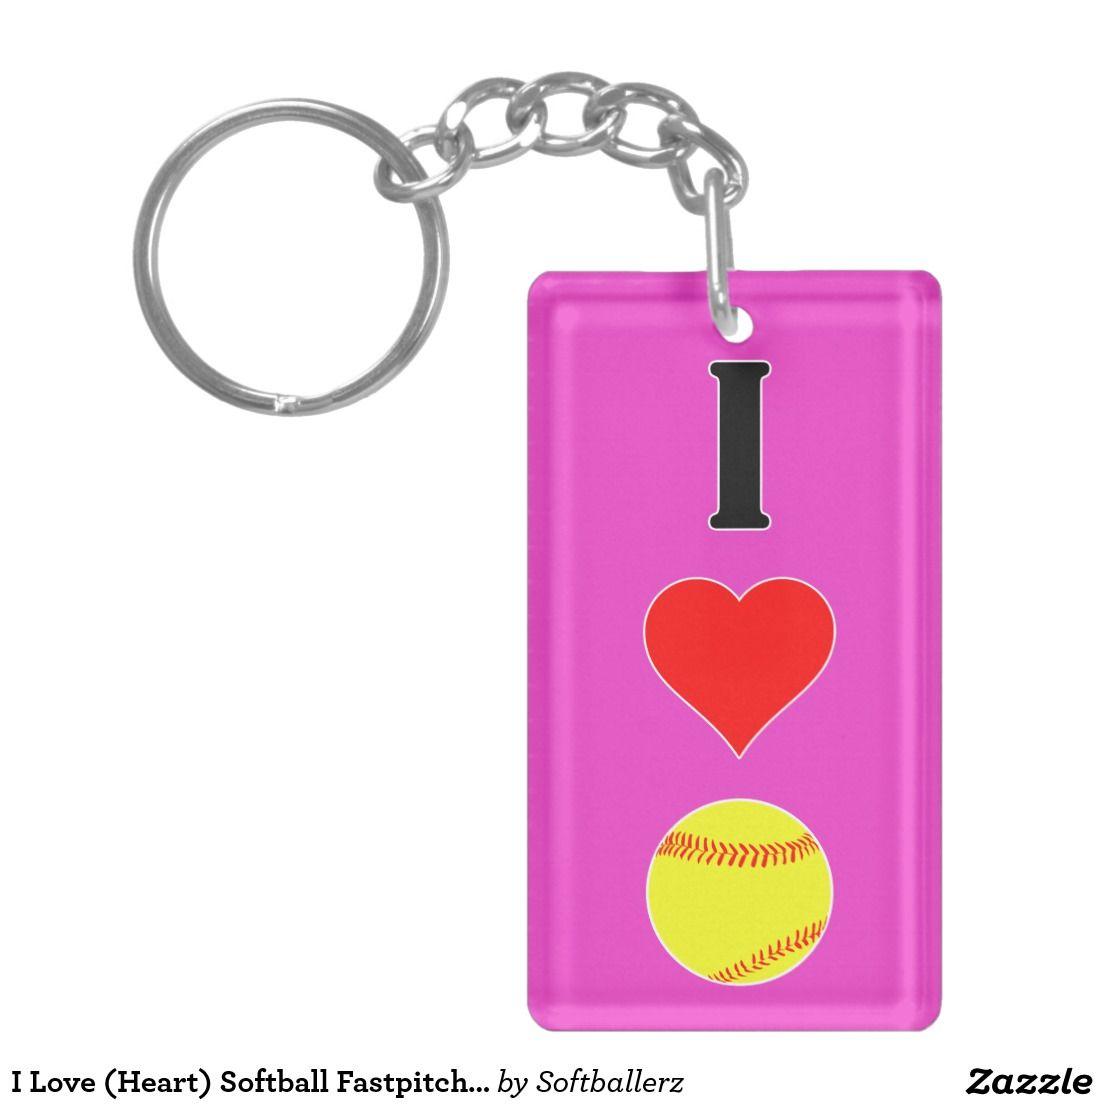 I Love (Heart) Softball Fastpitch Softball Keyring Keychain #softball #fastpitch #keyring